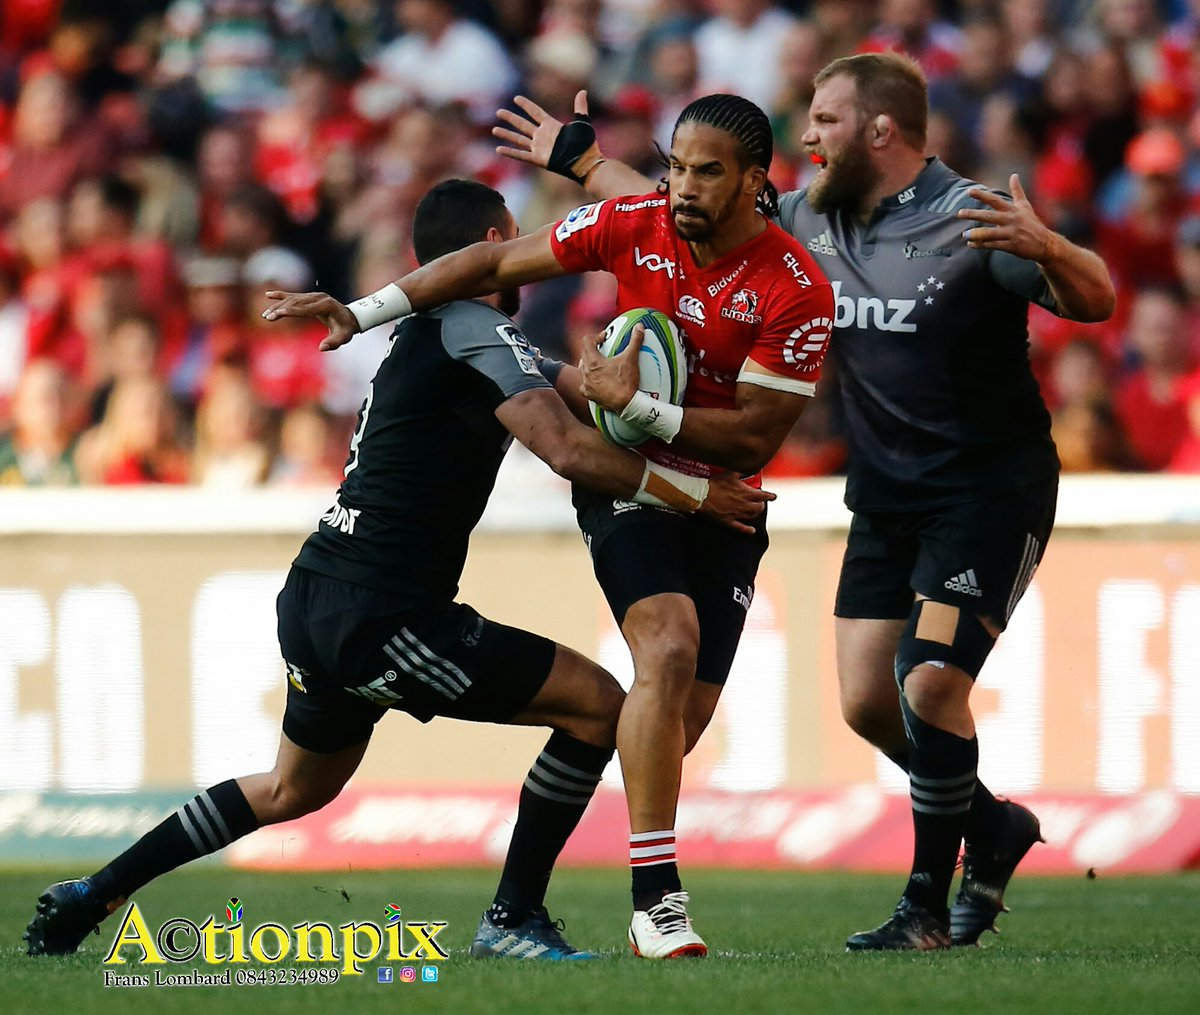 #BLUvLIO LEES HIER: DIE LIONS SE BRUL IS WEG ➡️rugby15.co.za/emirates-lions… @RugbyFifteen @RADIORUGBY2 @WarrenWhiteley @13LionelMapoe14 FOTO: ©Frans Lombard @Actionpixsa